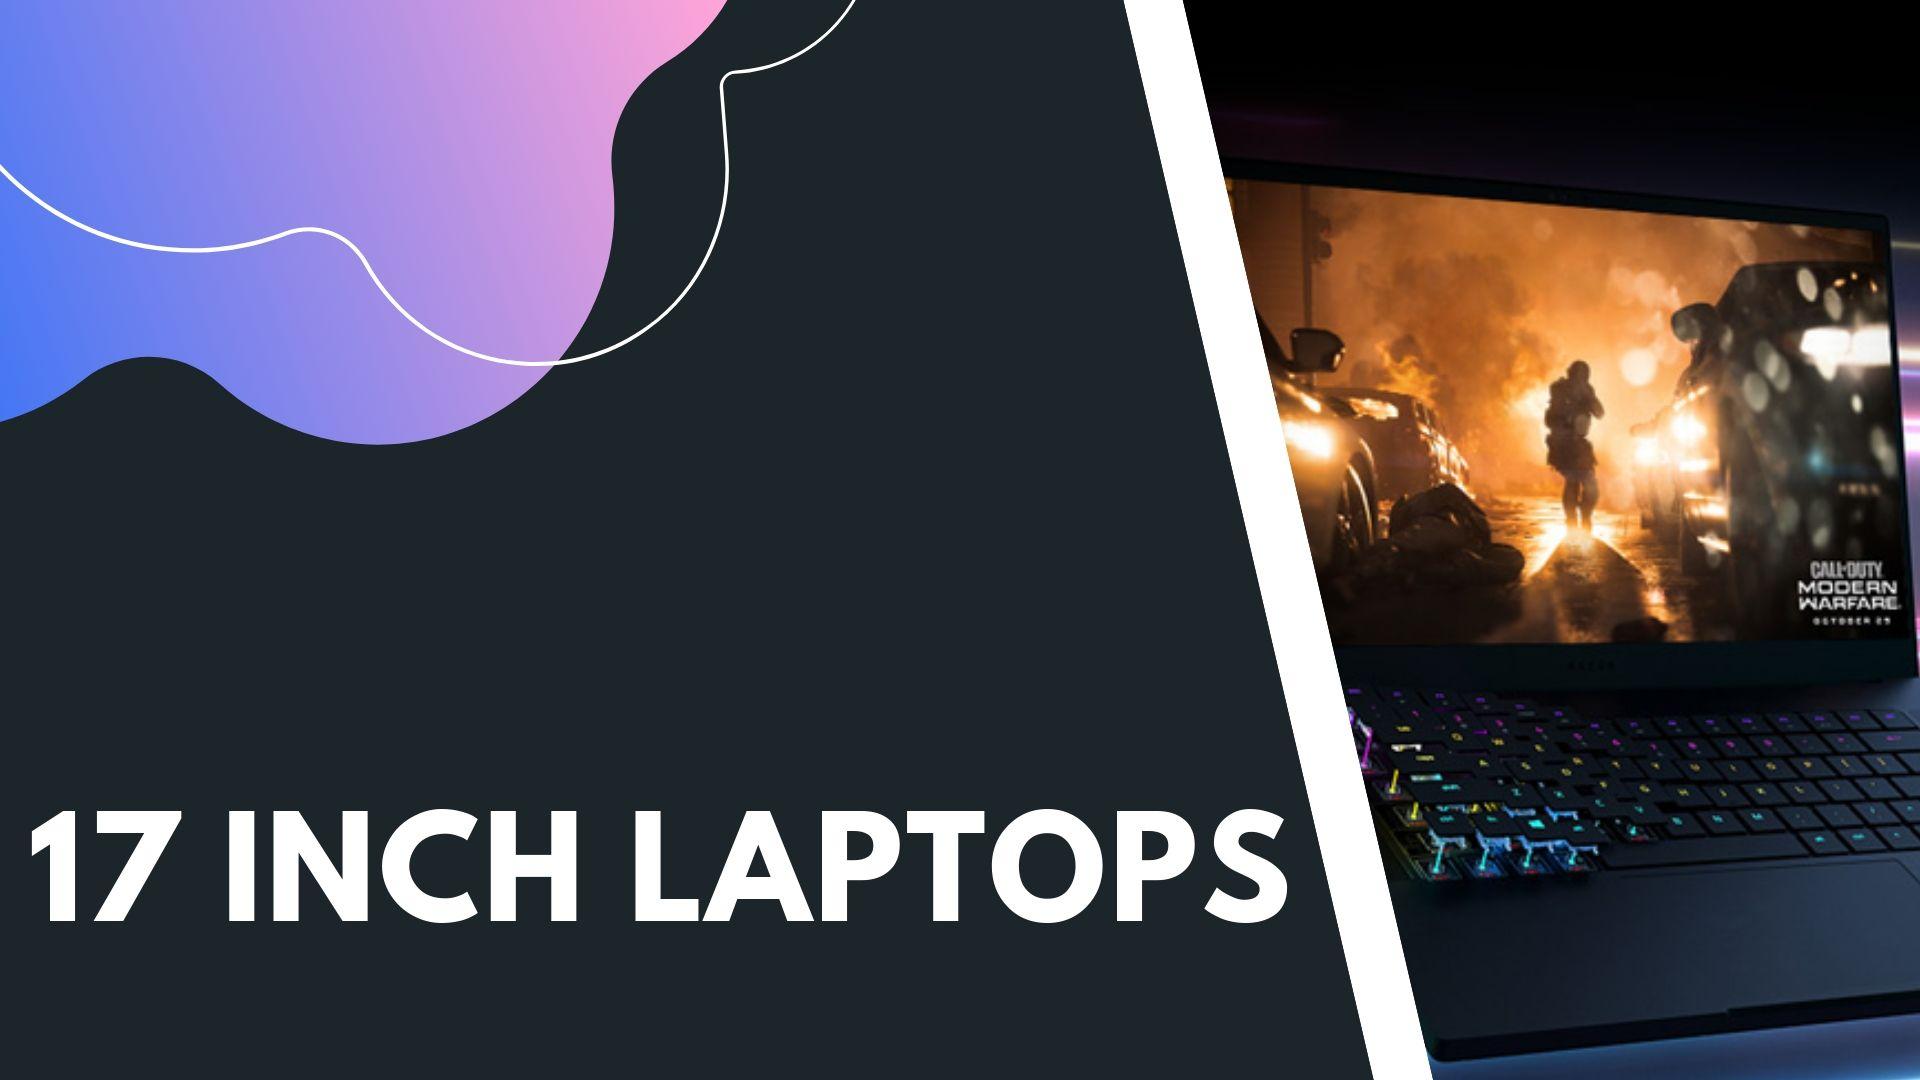 17 inch laptop